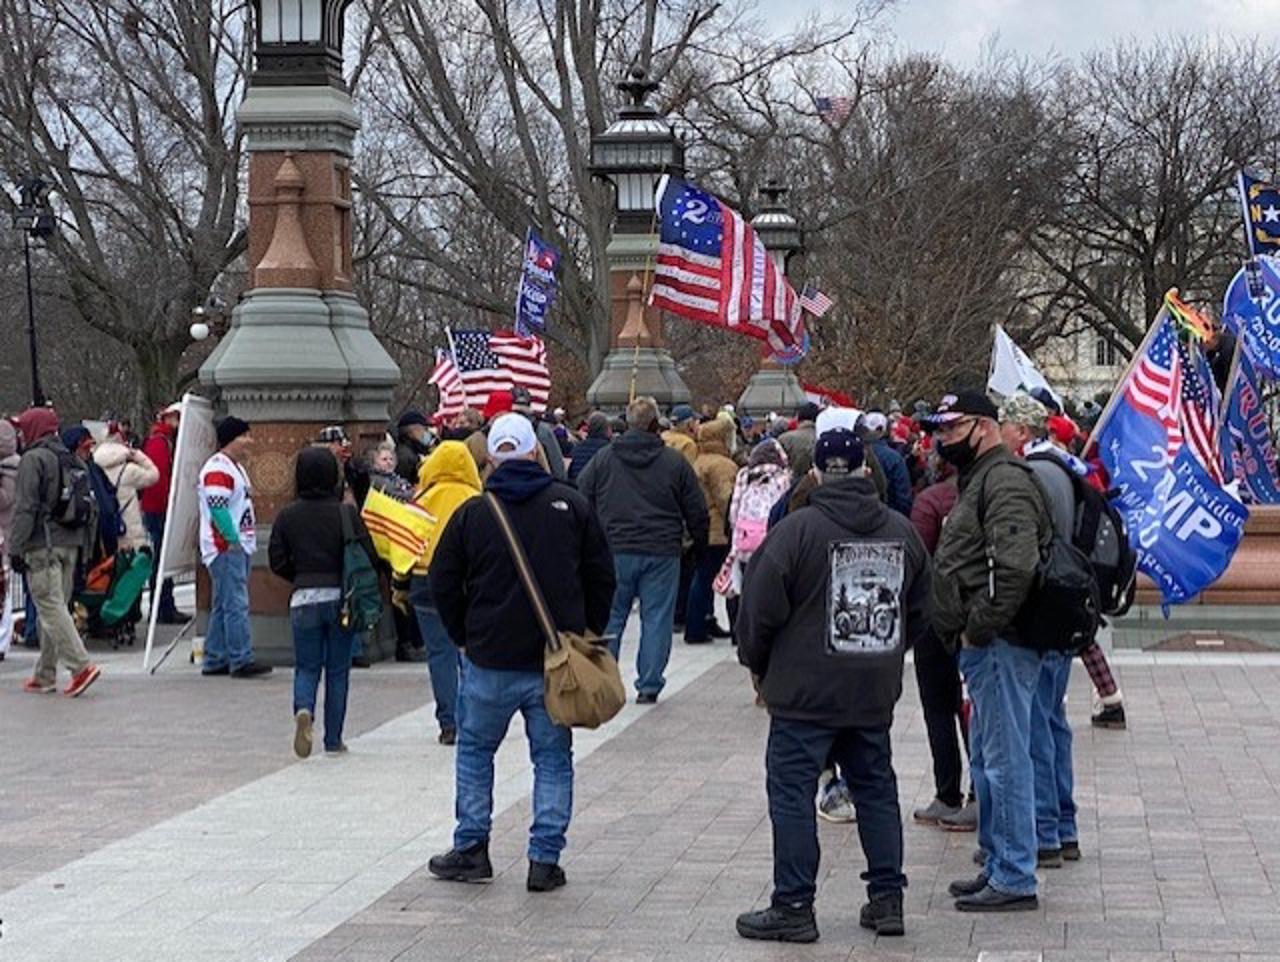 Jim Costa photo, Jan. 6 morning protest at Capitol